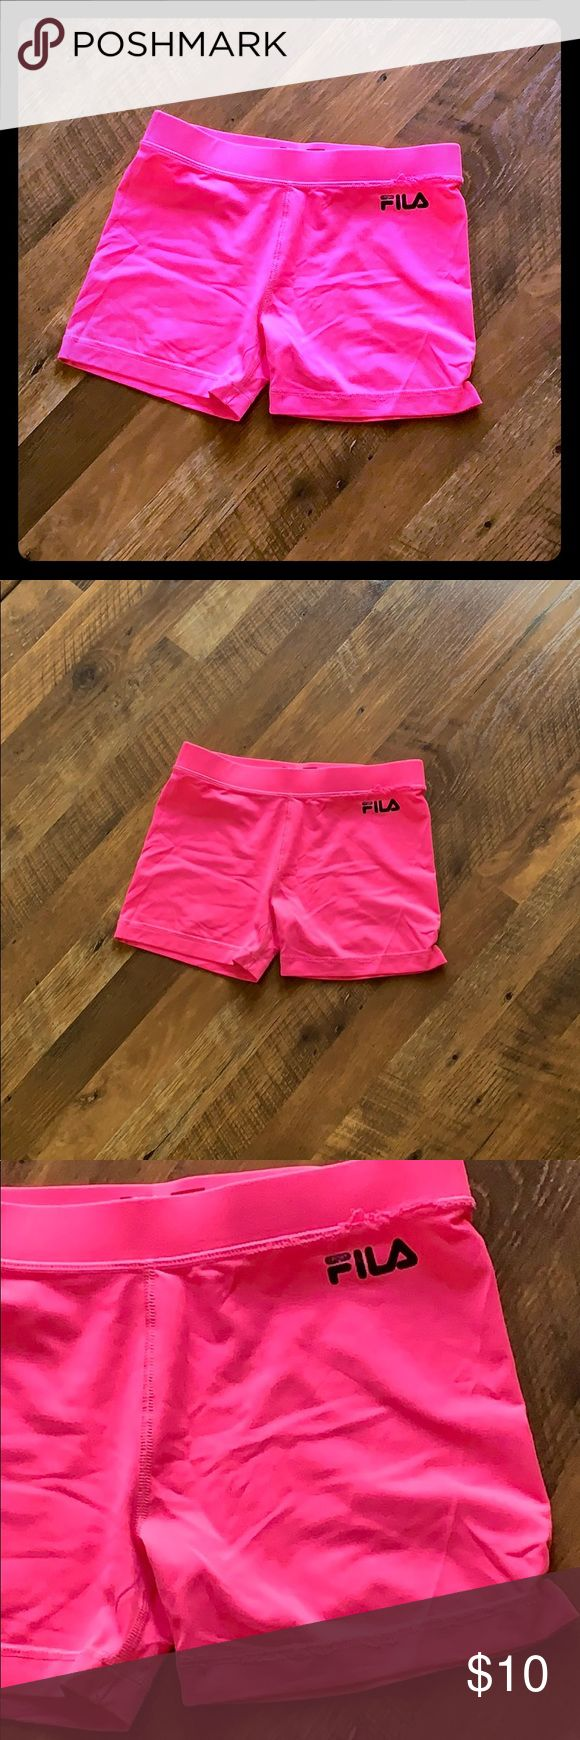 Fila Biker shorts used them for under dresses perfect Condition Fila Bottoms Sho…   – My Posh Closet